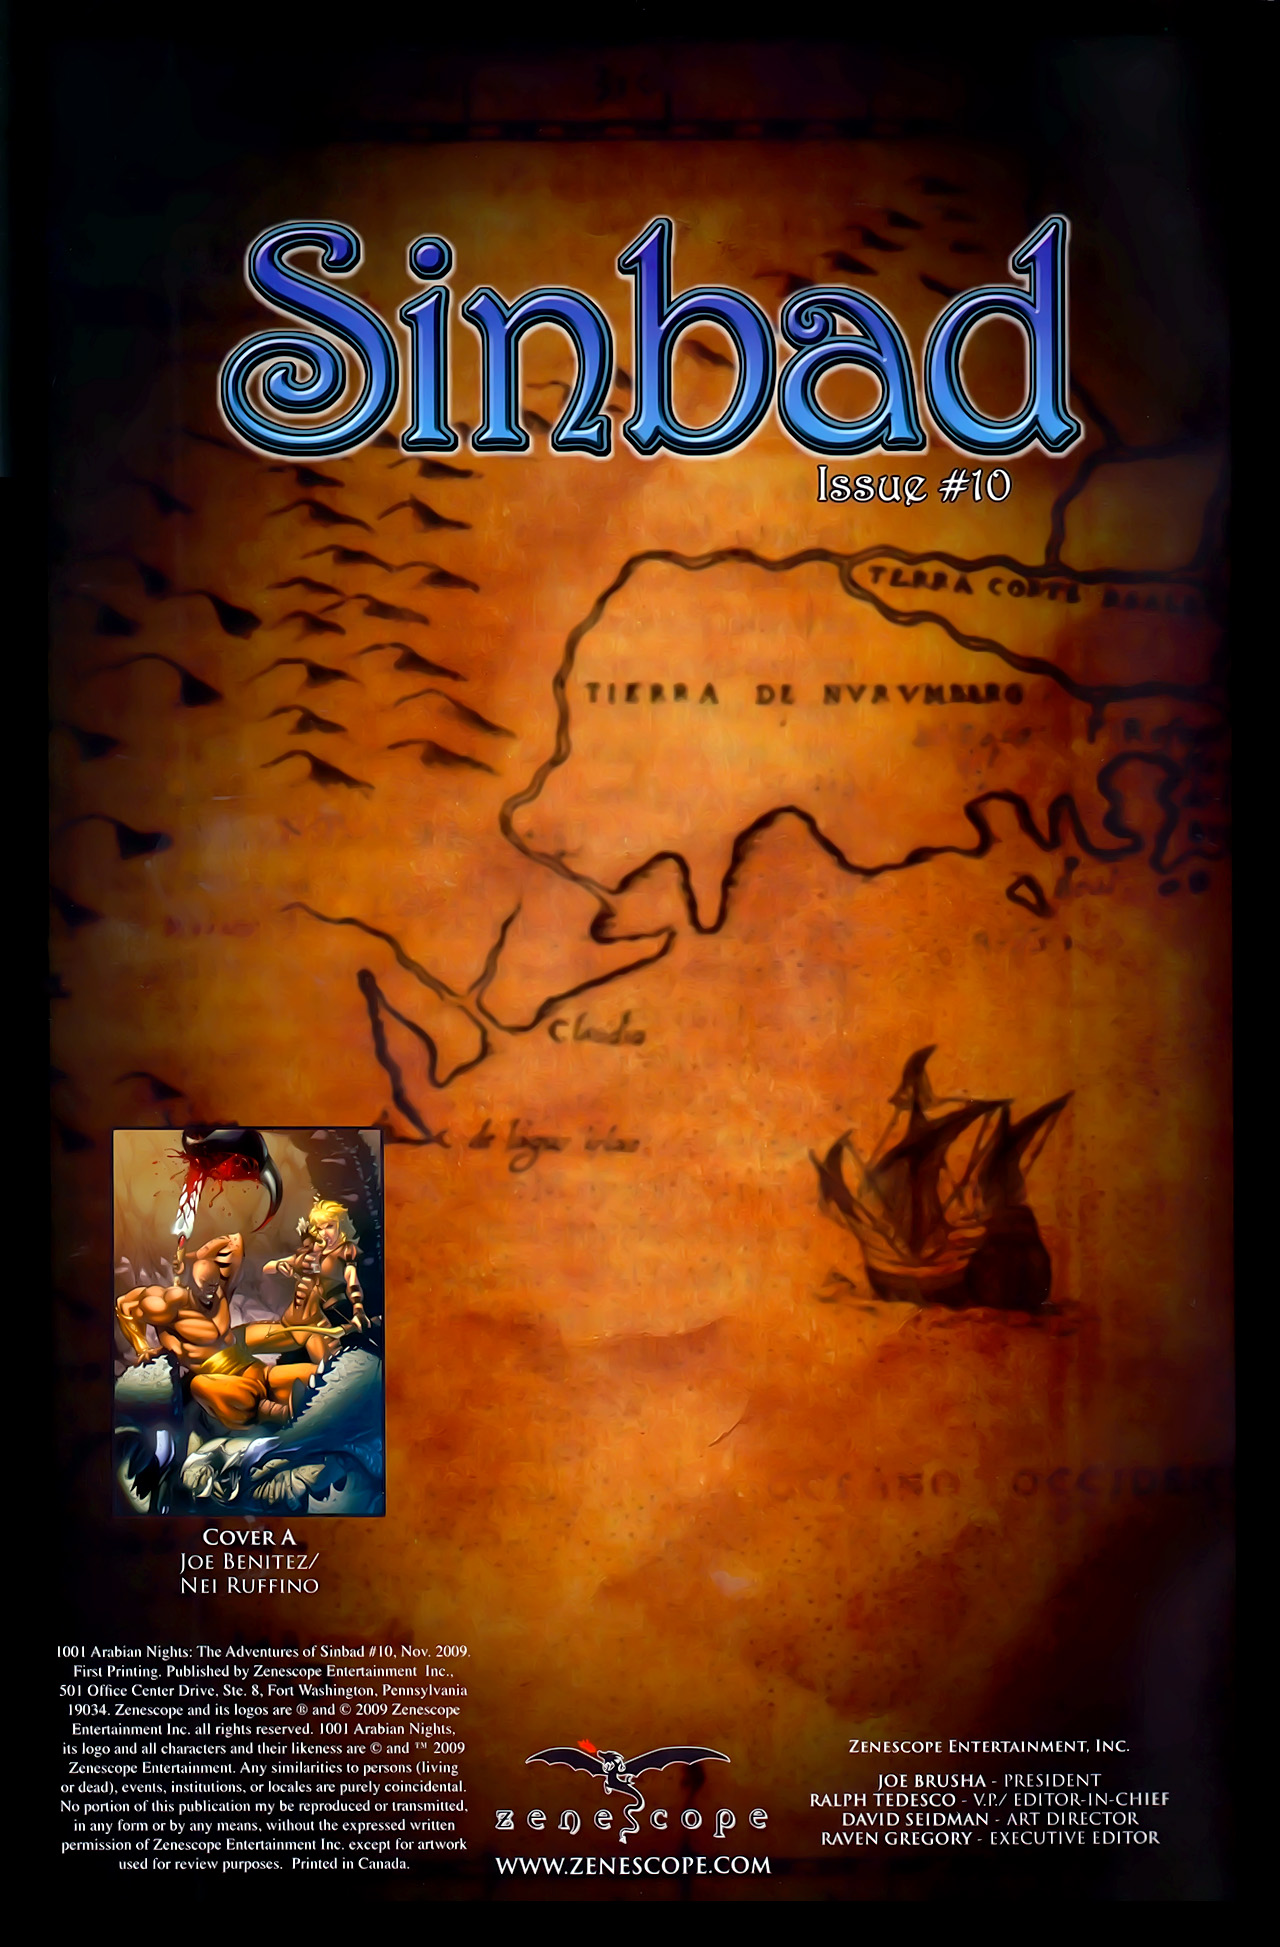 Read online 1001 Arabian Nights: The Adventures of Sinbad comic -  Issue #10 - 2